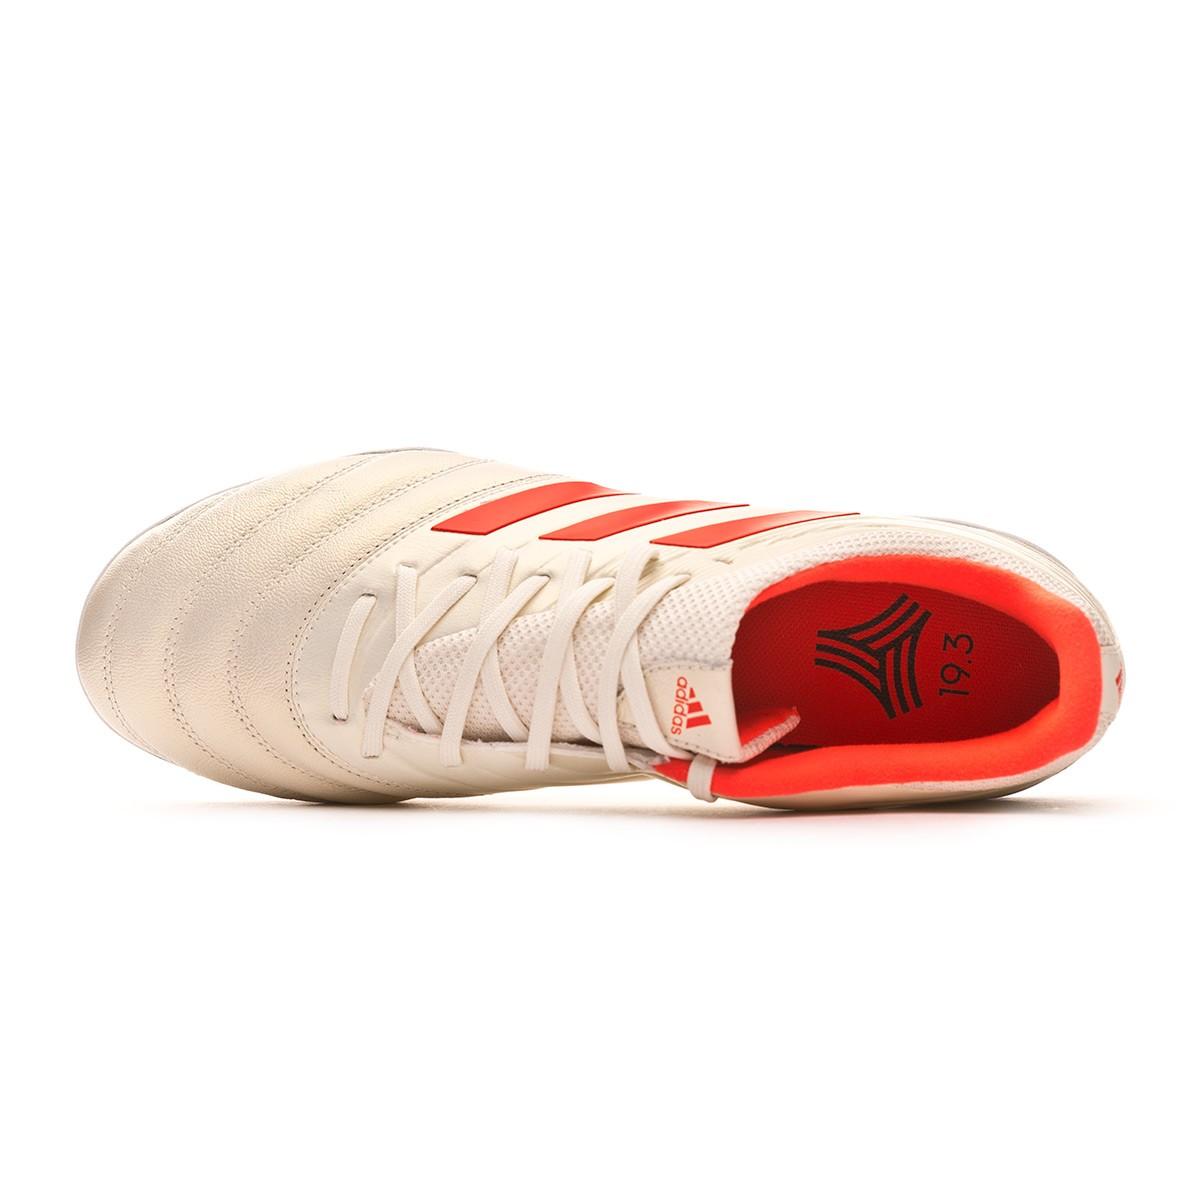 Chaussure de football adidas Copa Tango 19.3 Turf Off white